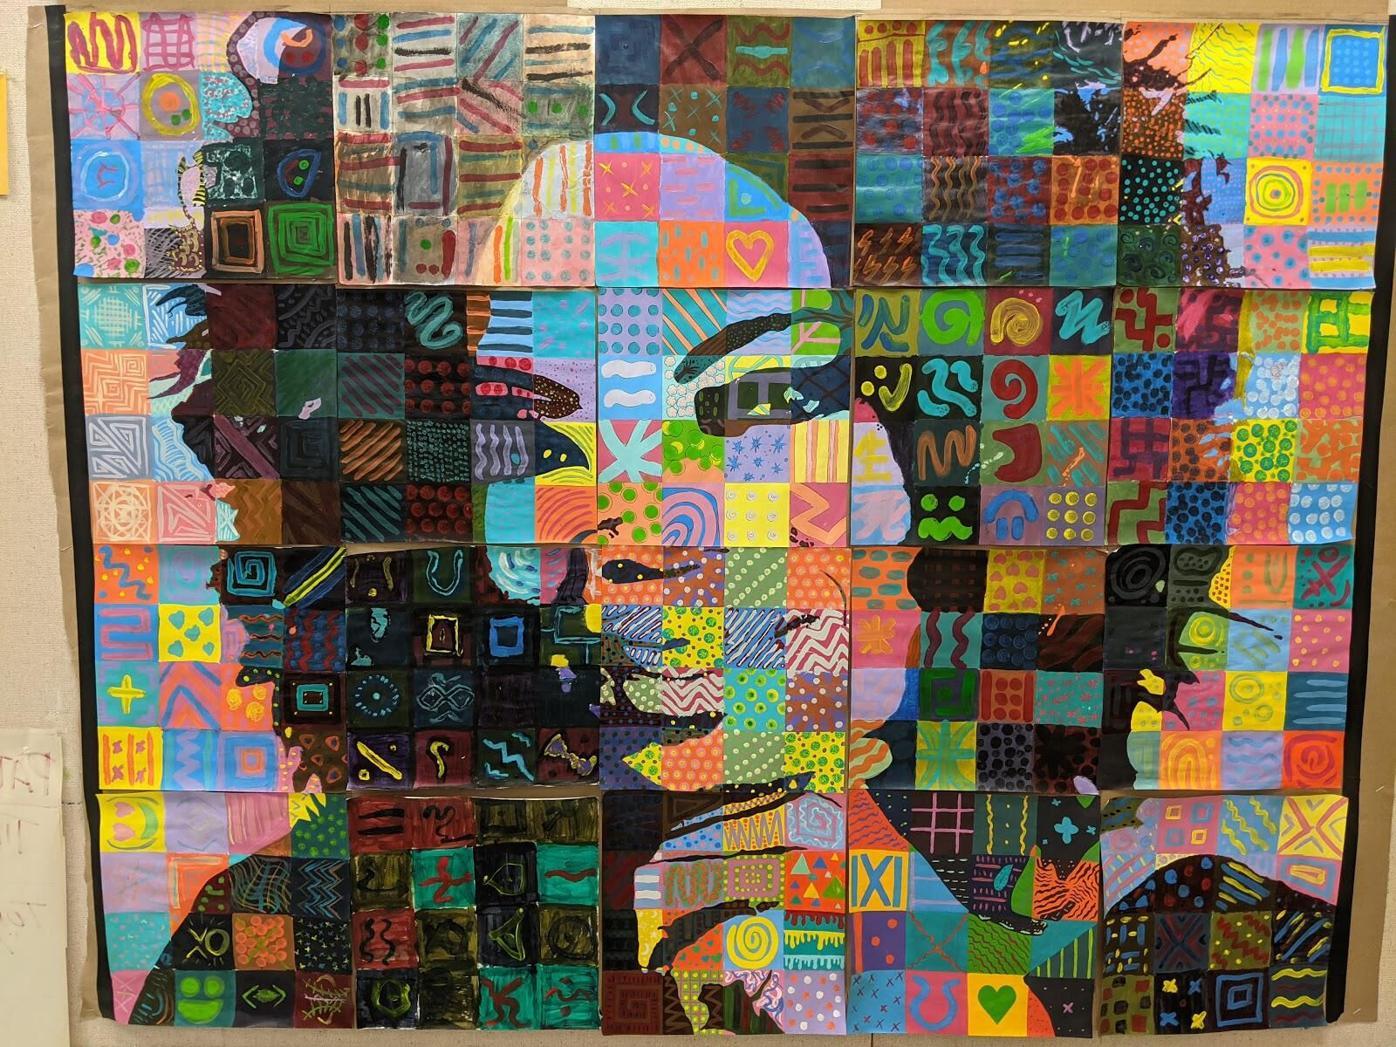 Black History Month Murals